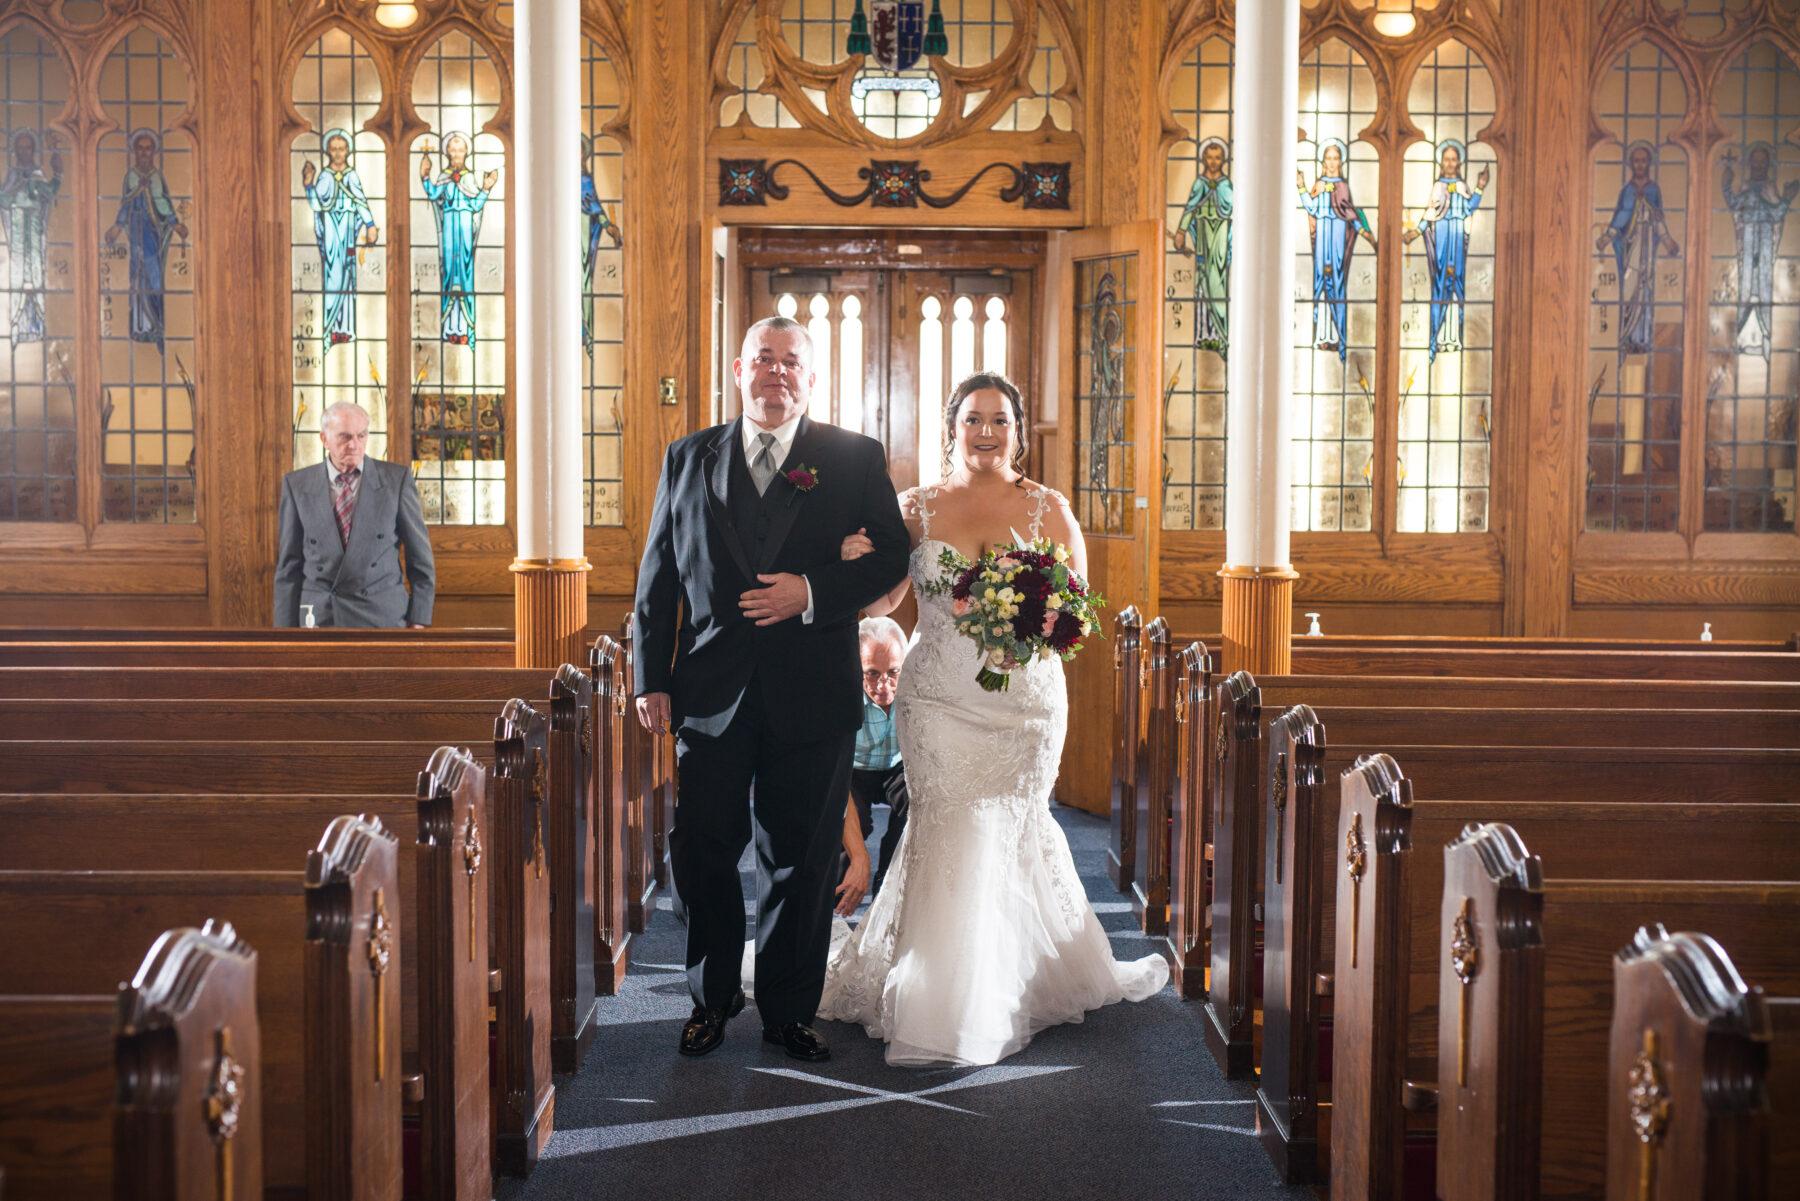 Rhodes on the Pawtuxet Cranston Wedding Carolyn and Tony Blueflash Photography 8